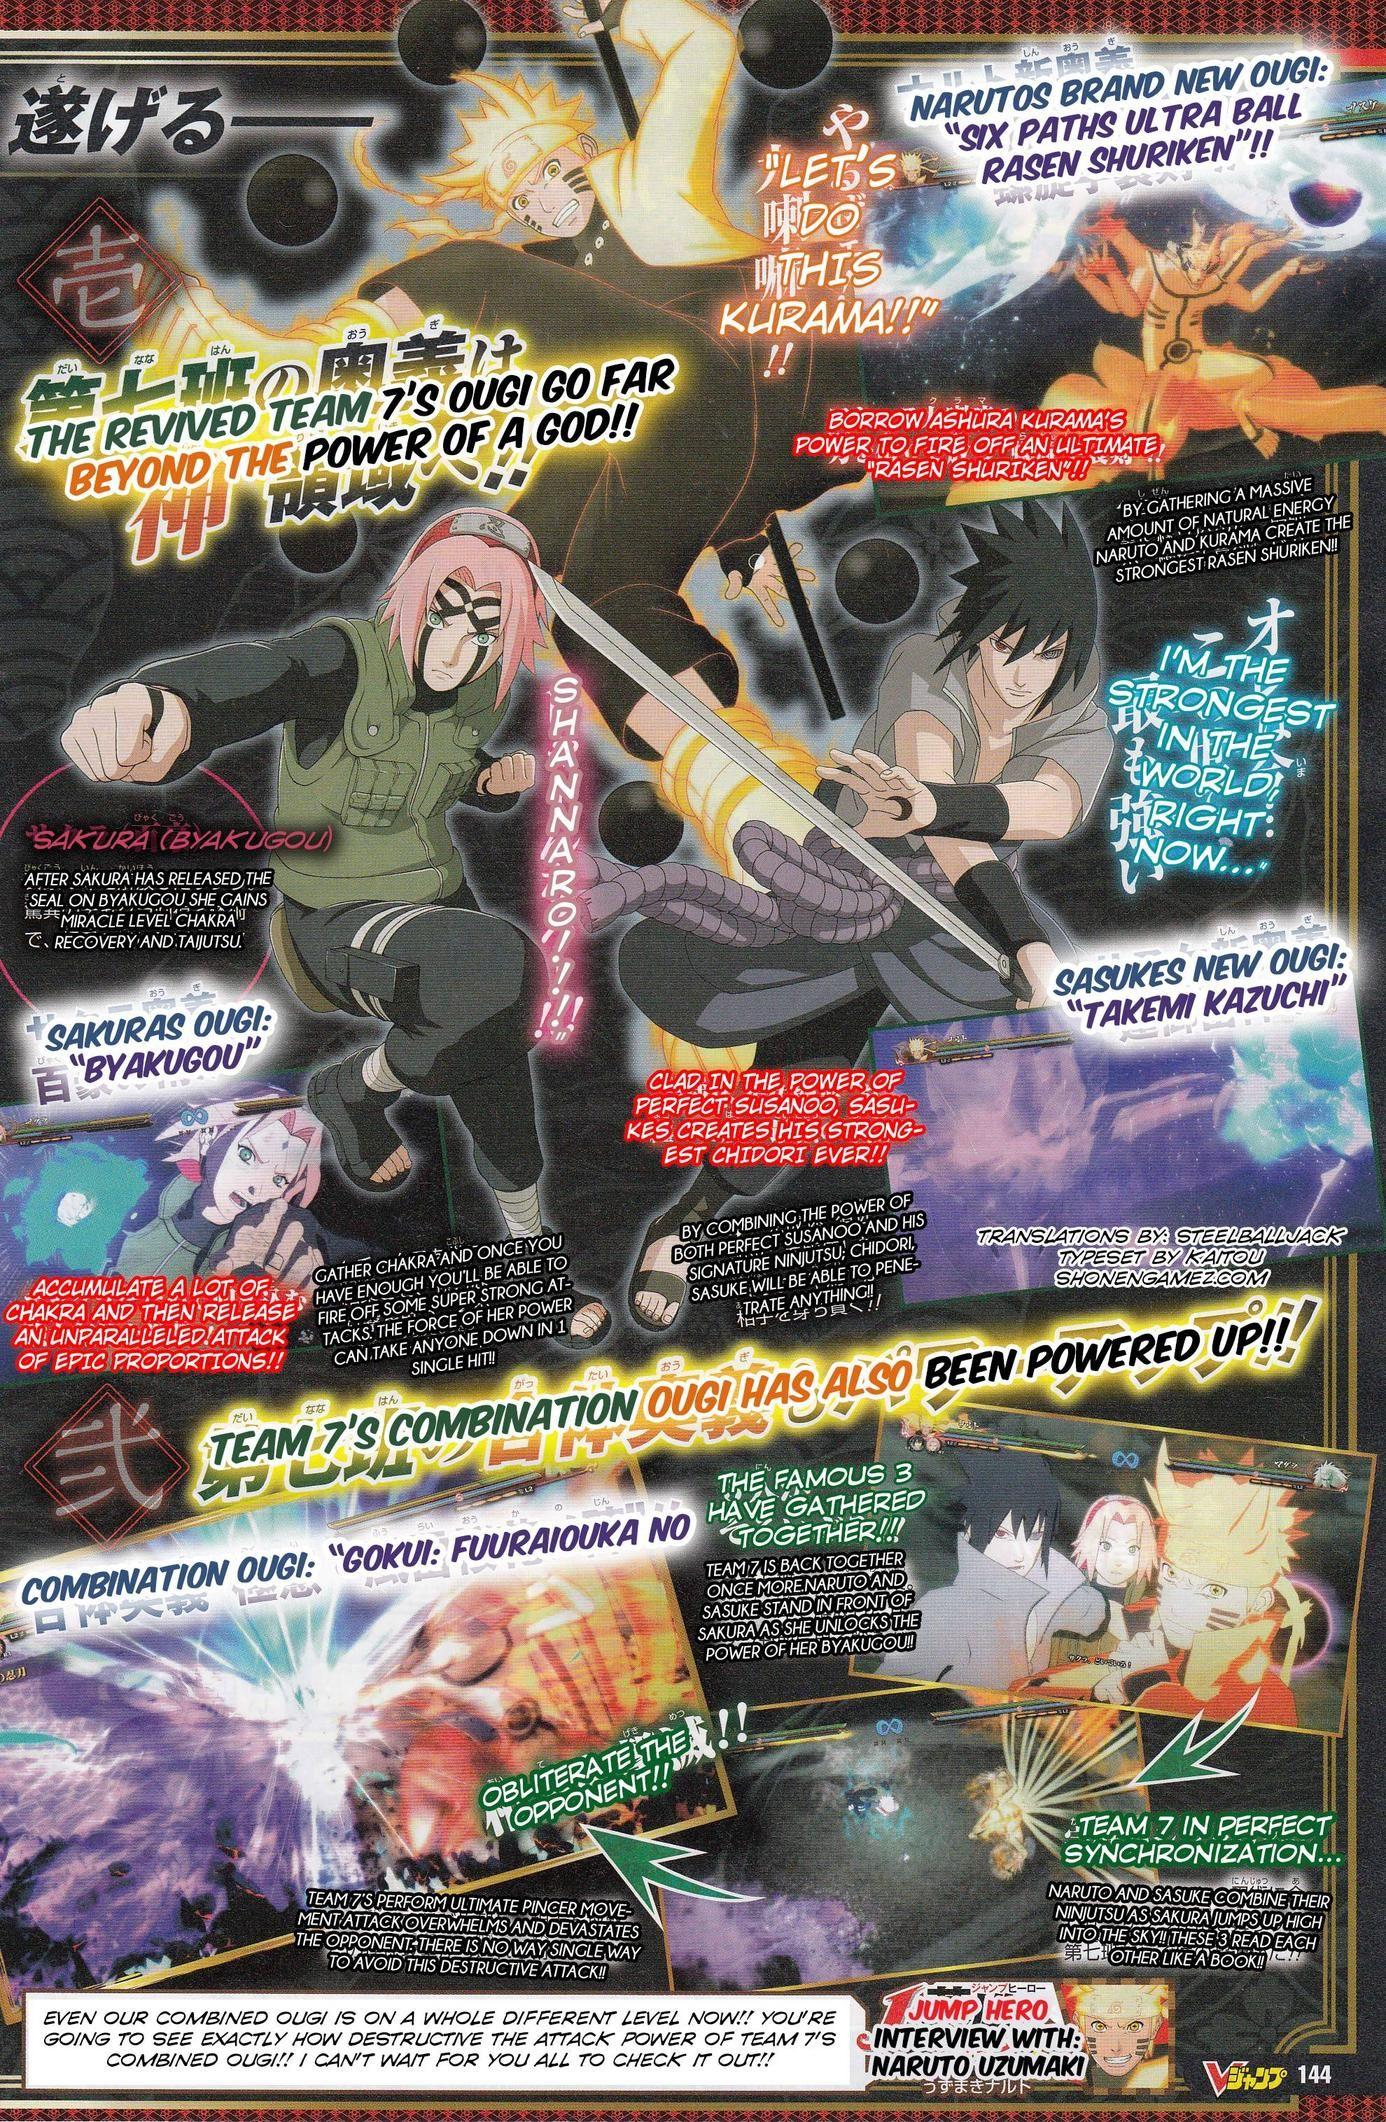 naruto-shippuden-ultimate-ninja-storm-4-jutsu-combinati-01